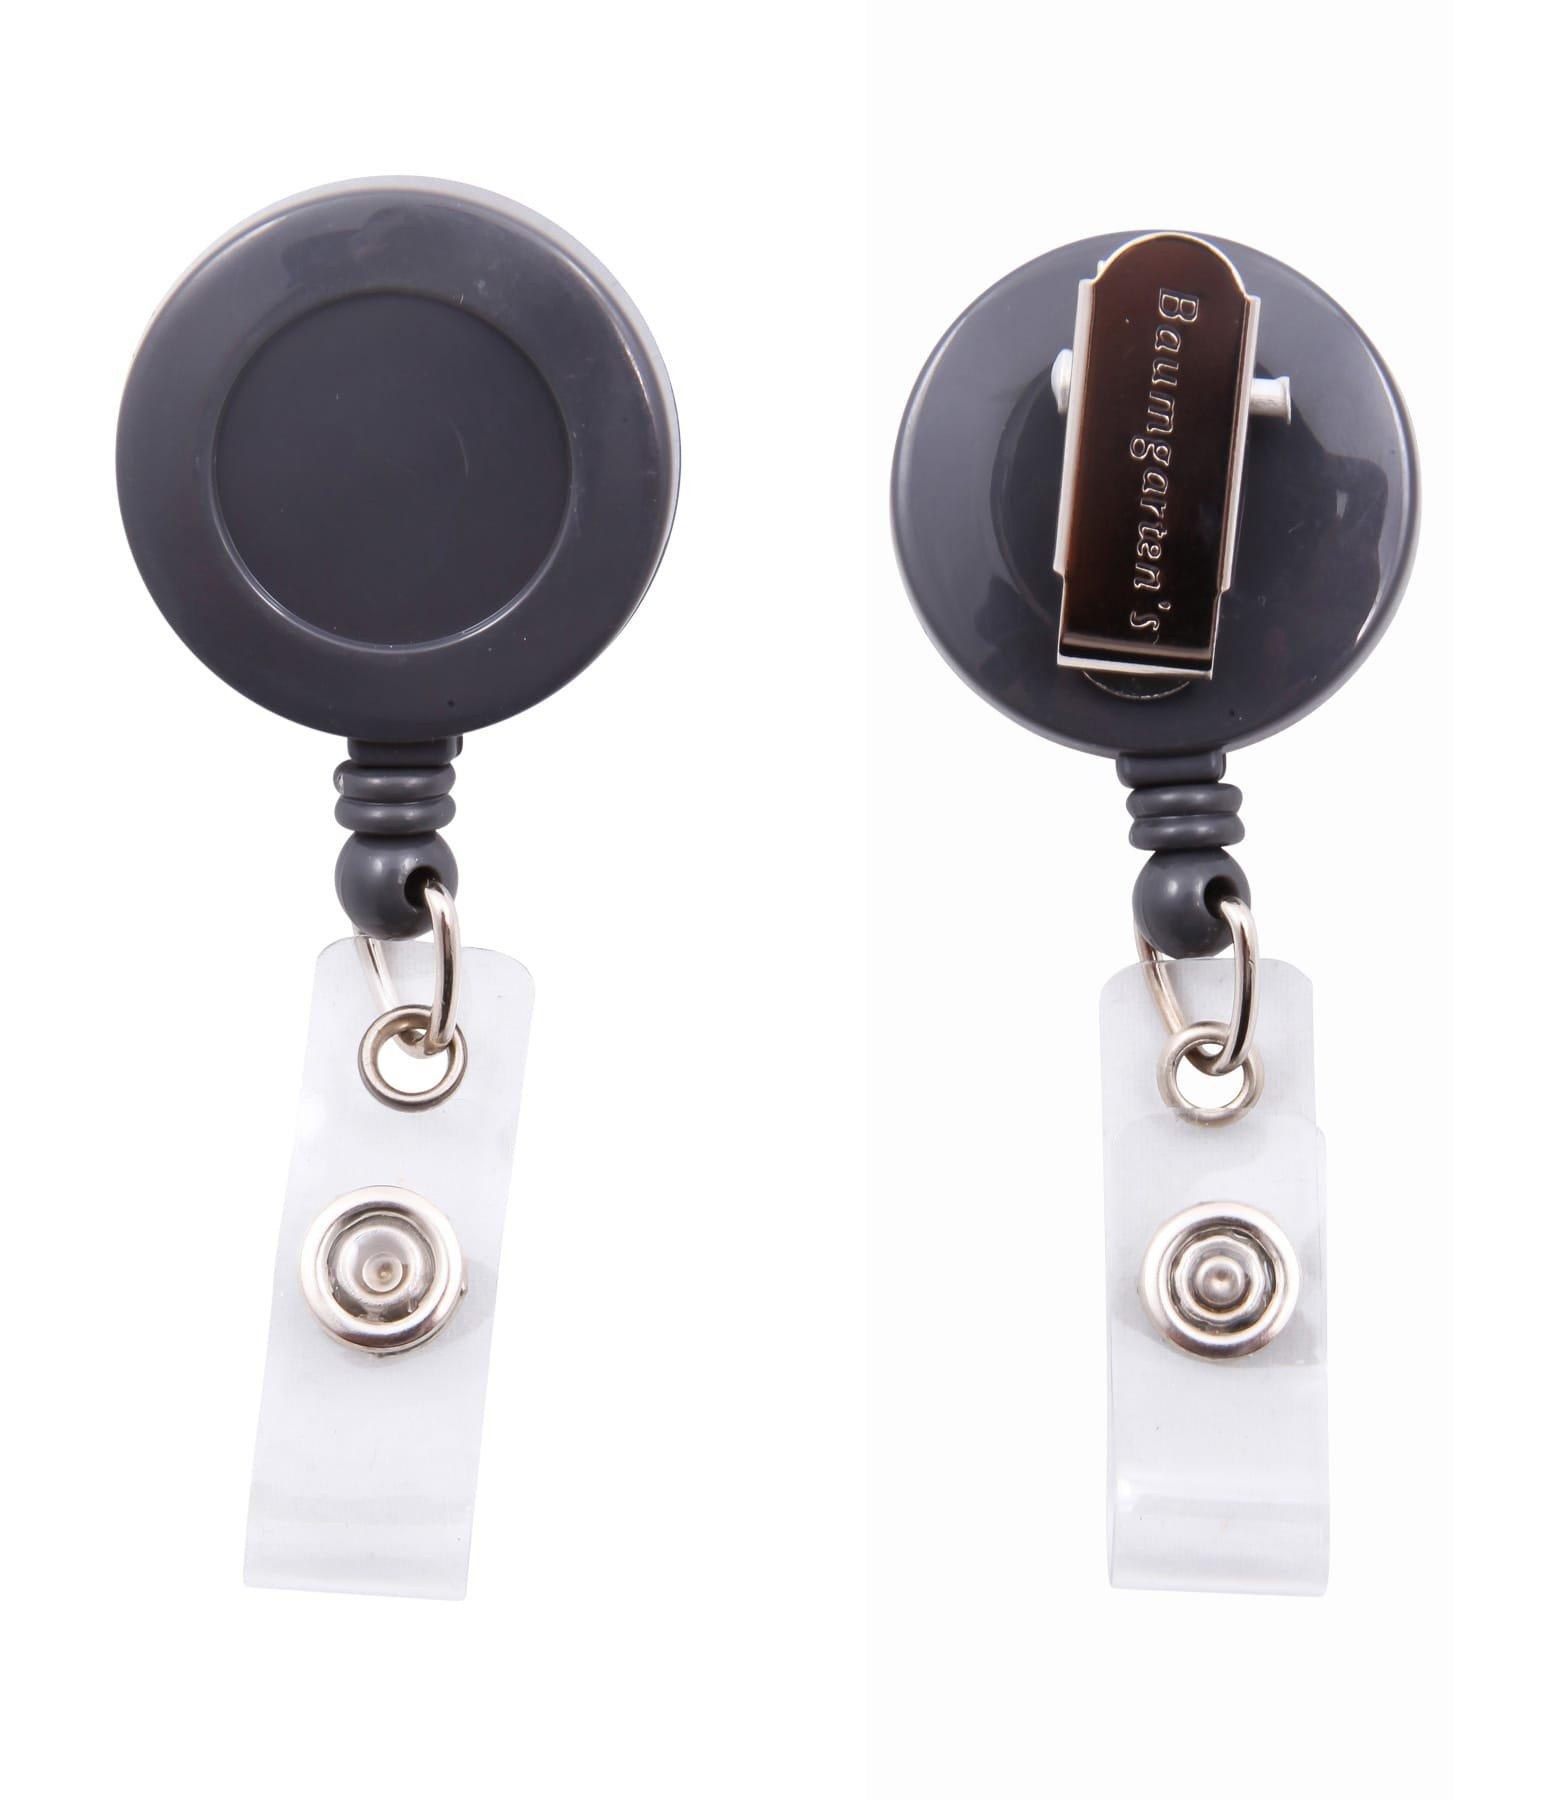 SICURIX Standard ID Badge Reel Round Swivel Spring Clip Strap 1 Each Grey (Pack of 600) (68840)